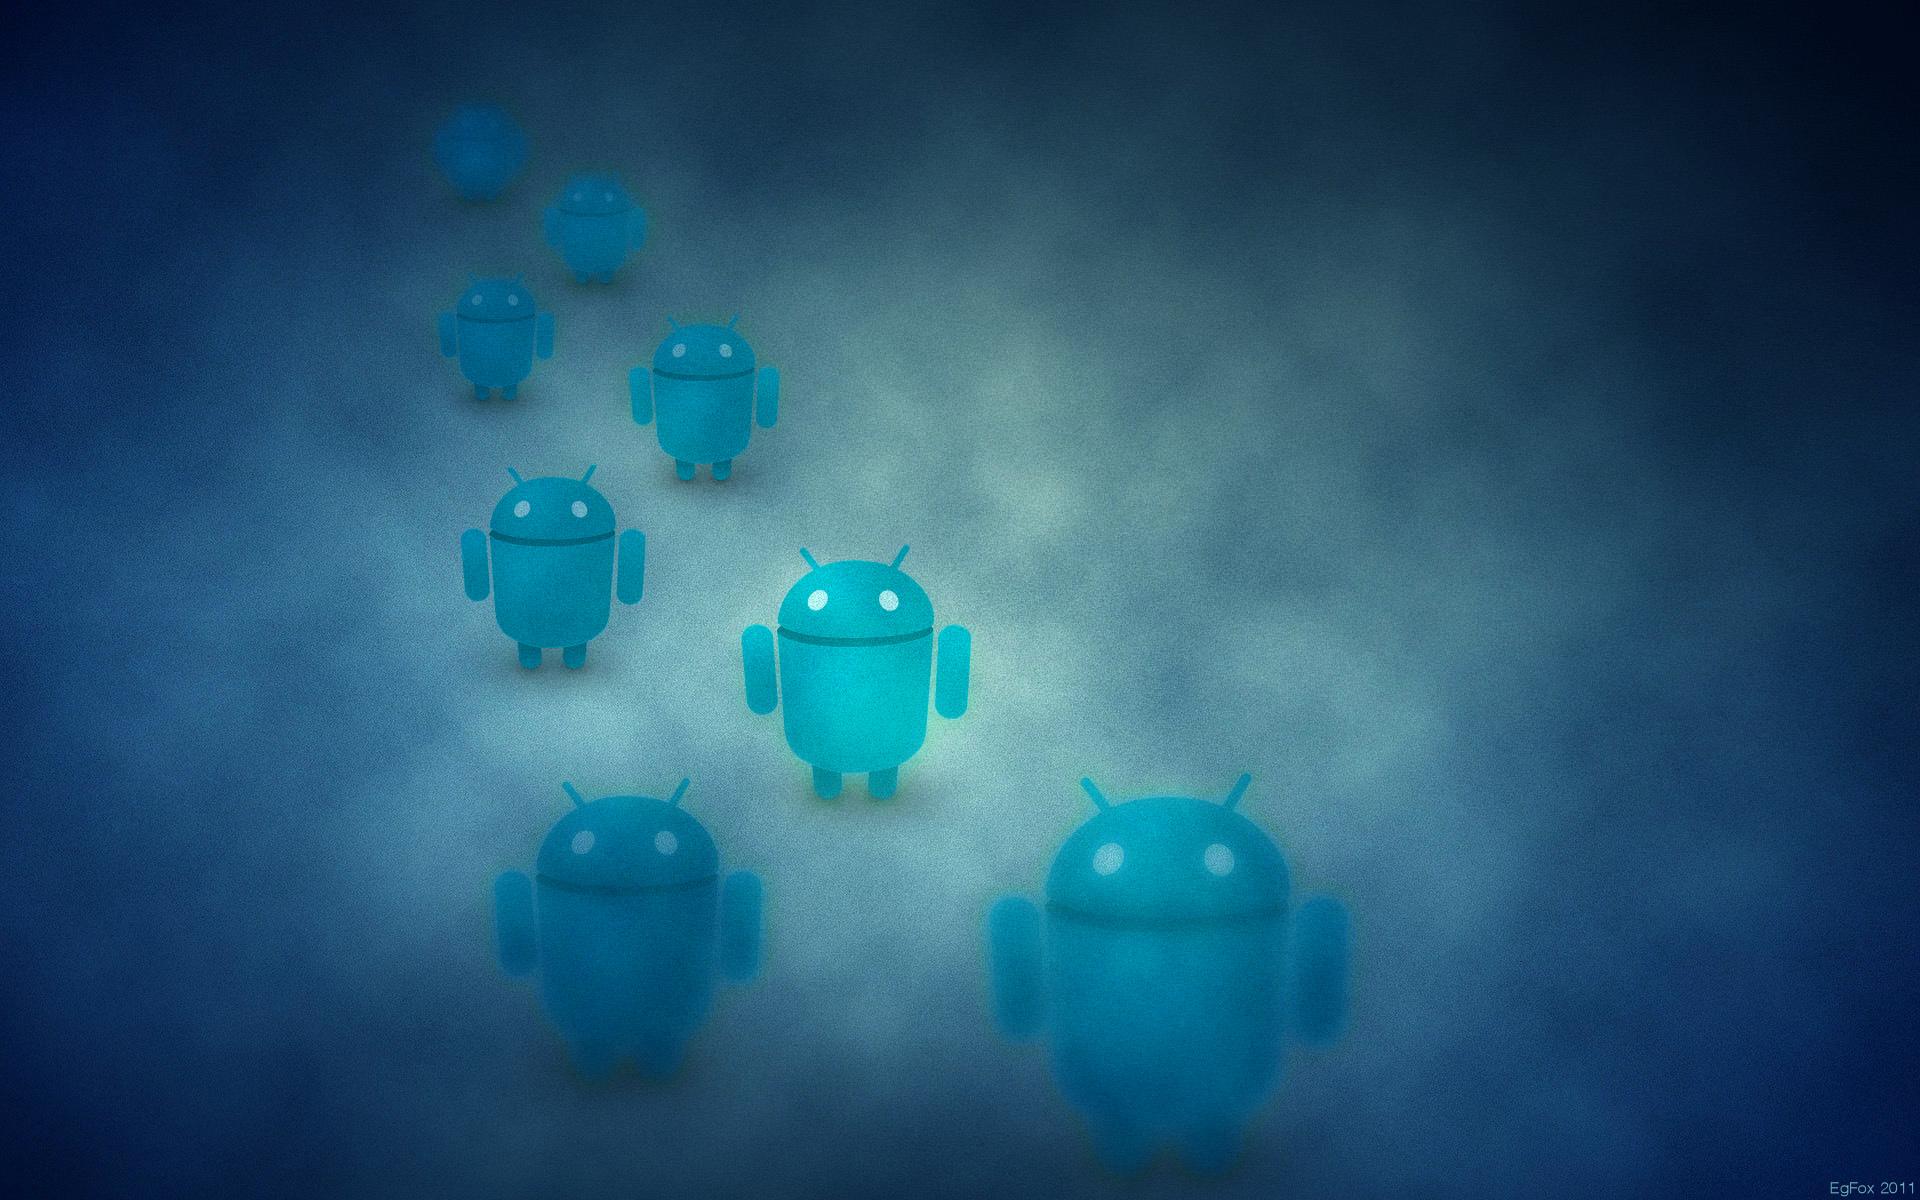 egfox android blue hd 2011 by eg art d3cyhbm Mükemmel HD Resimler